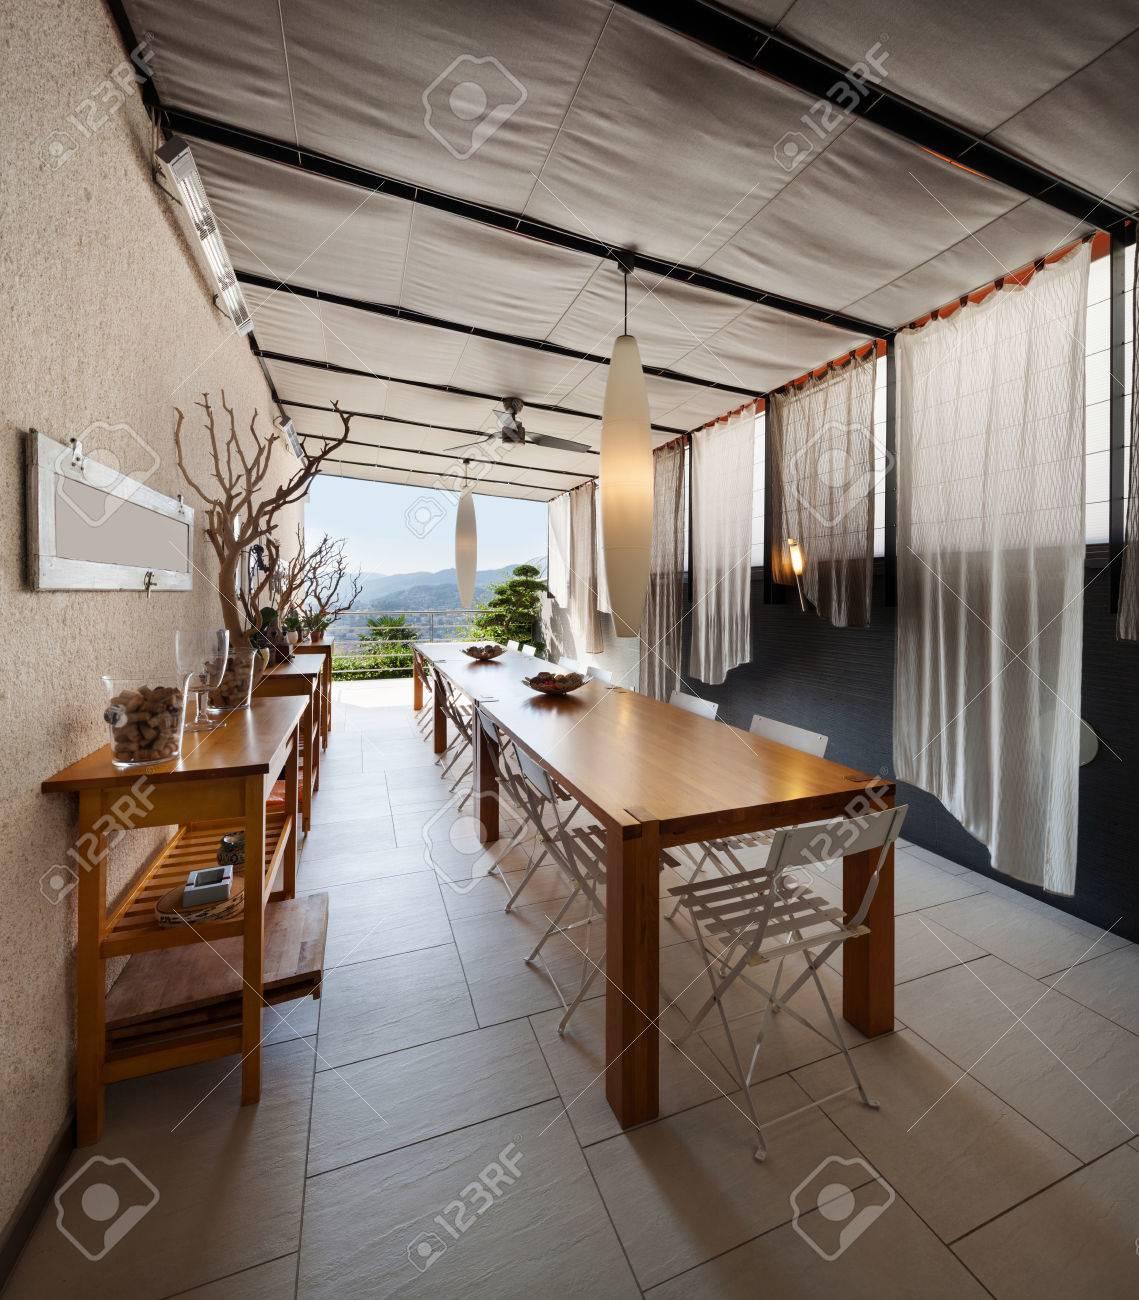 Interior De La Casa, La Cocina Doméstica Con Una Larga Mesa De ...